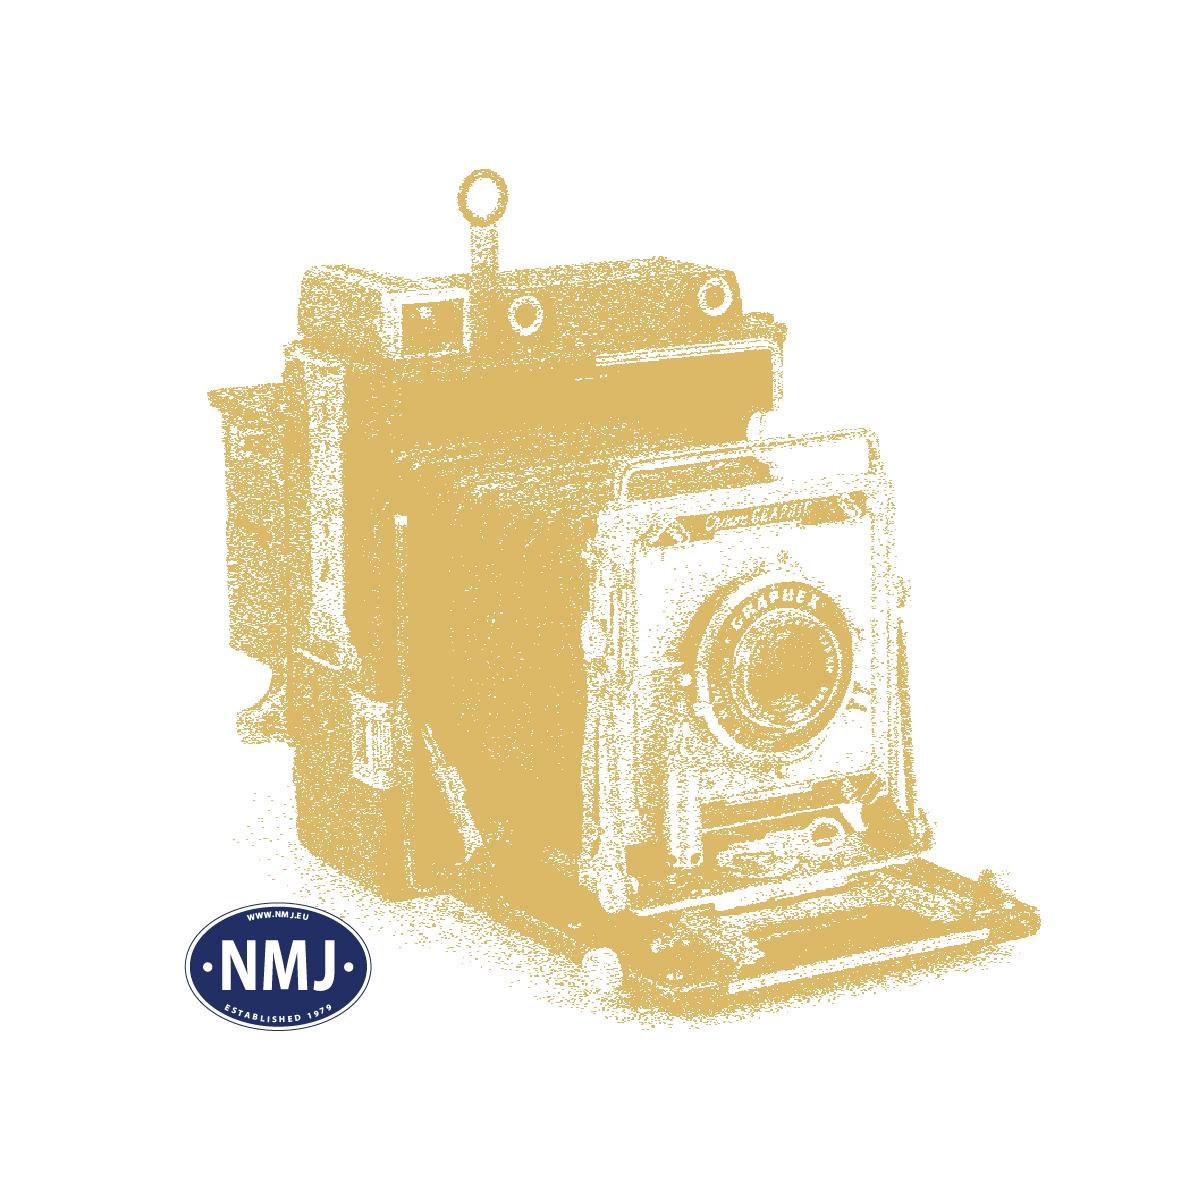 NMJT504.502 - NMJ Topline NSB His 210 2 998-2, type 5